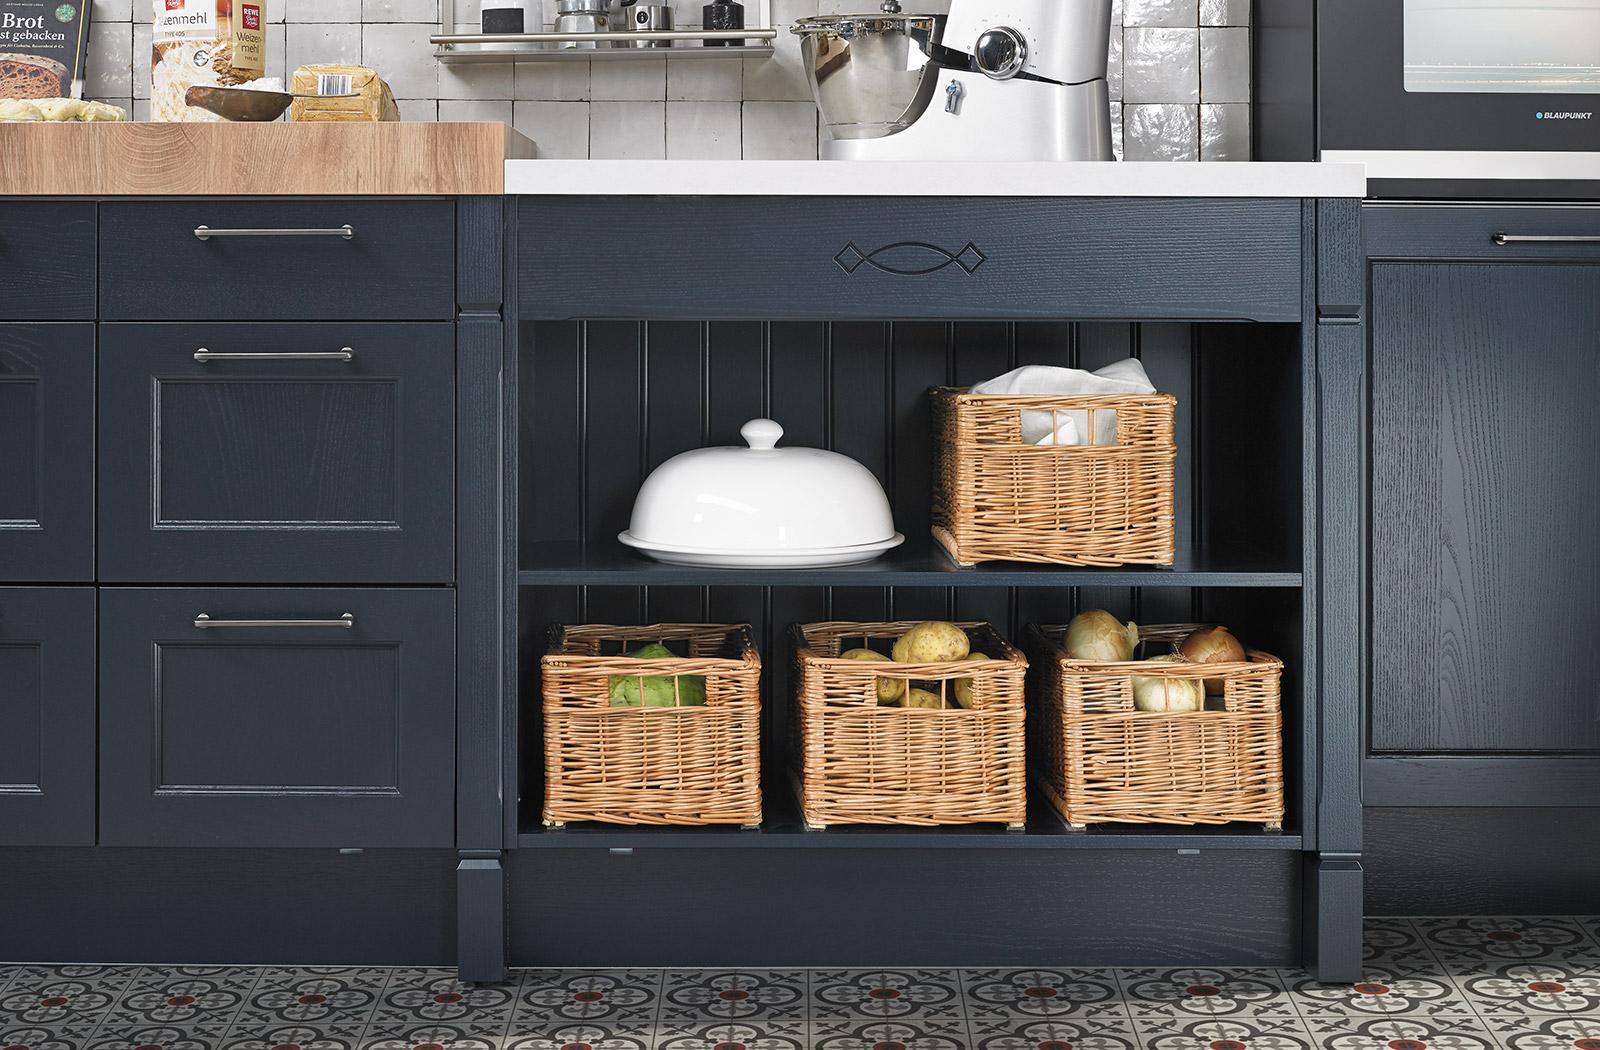 bristol velvet blue | Crowthorne Kitchens